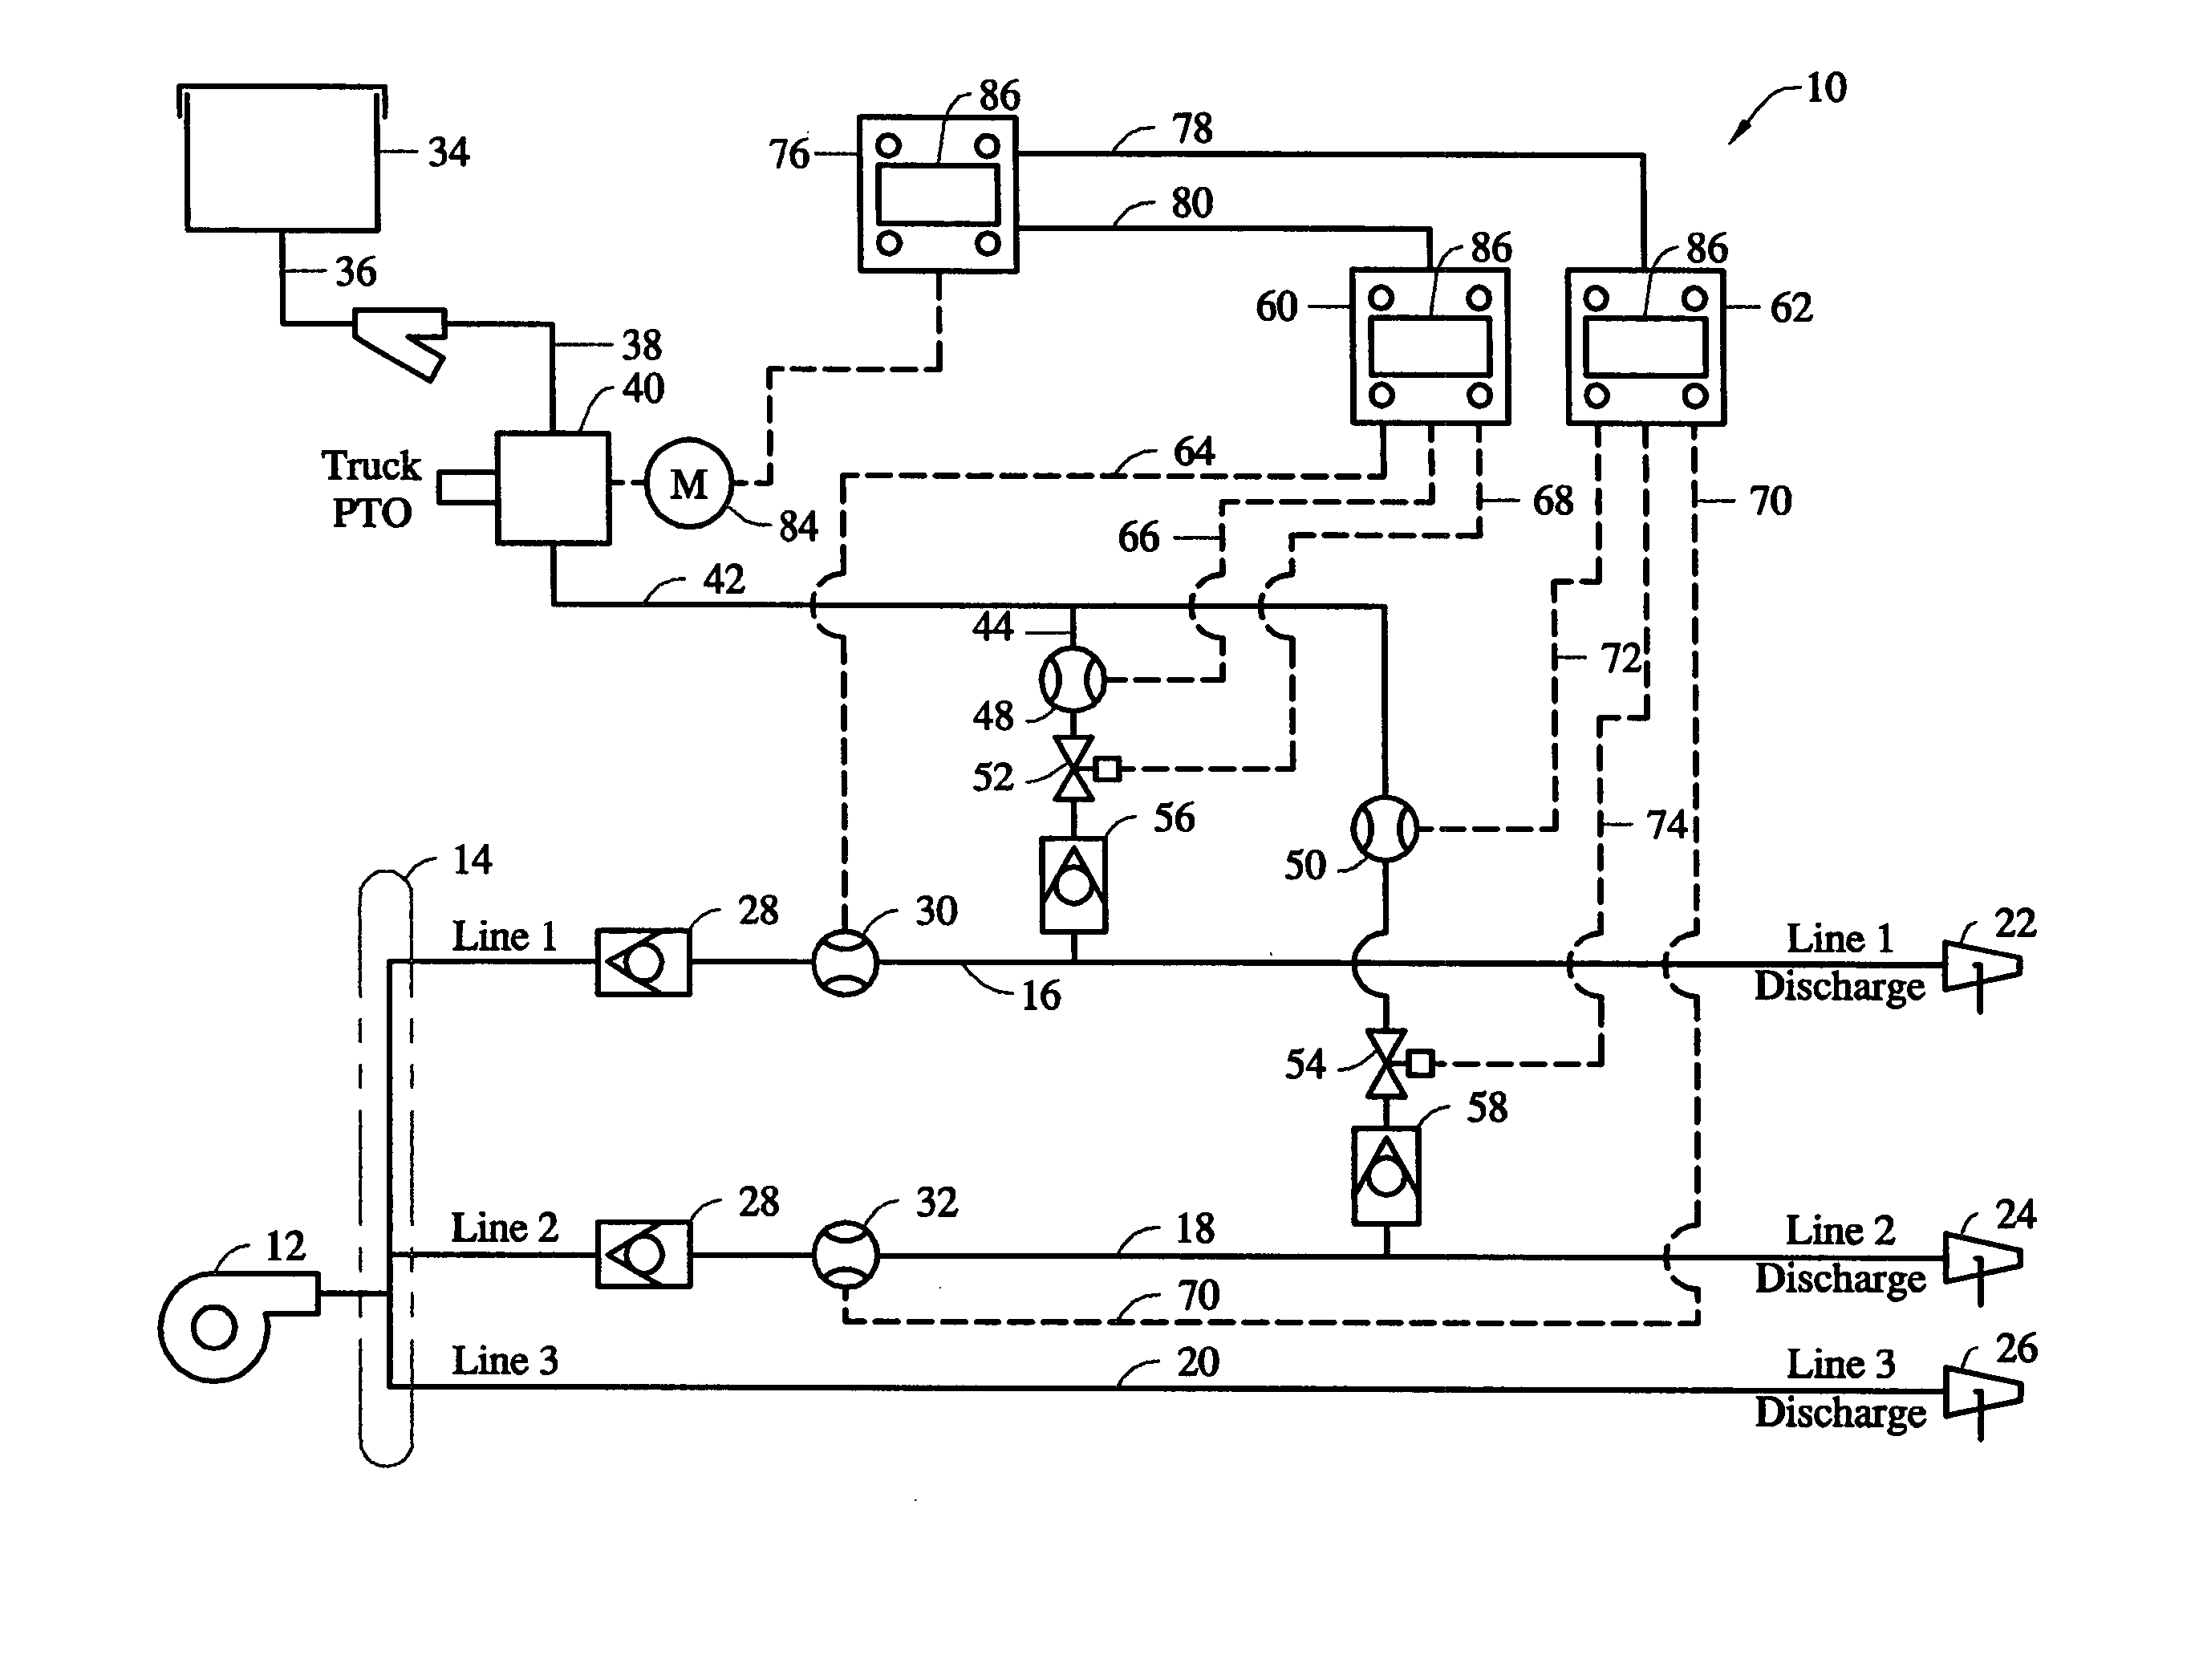 Ansul R 102 Wiring Diagram